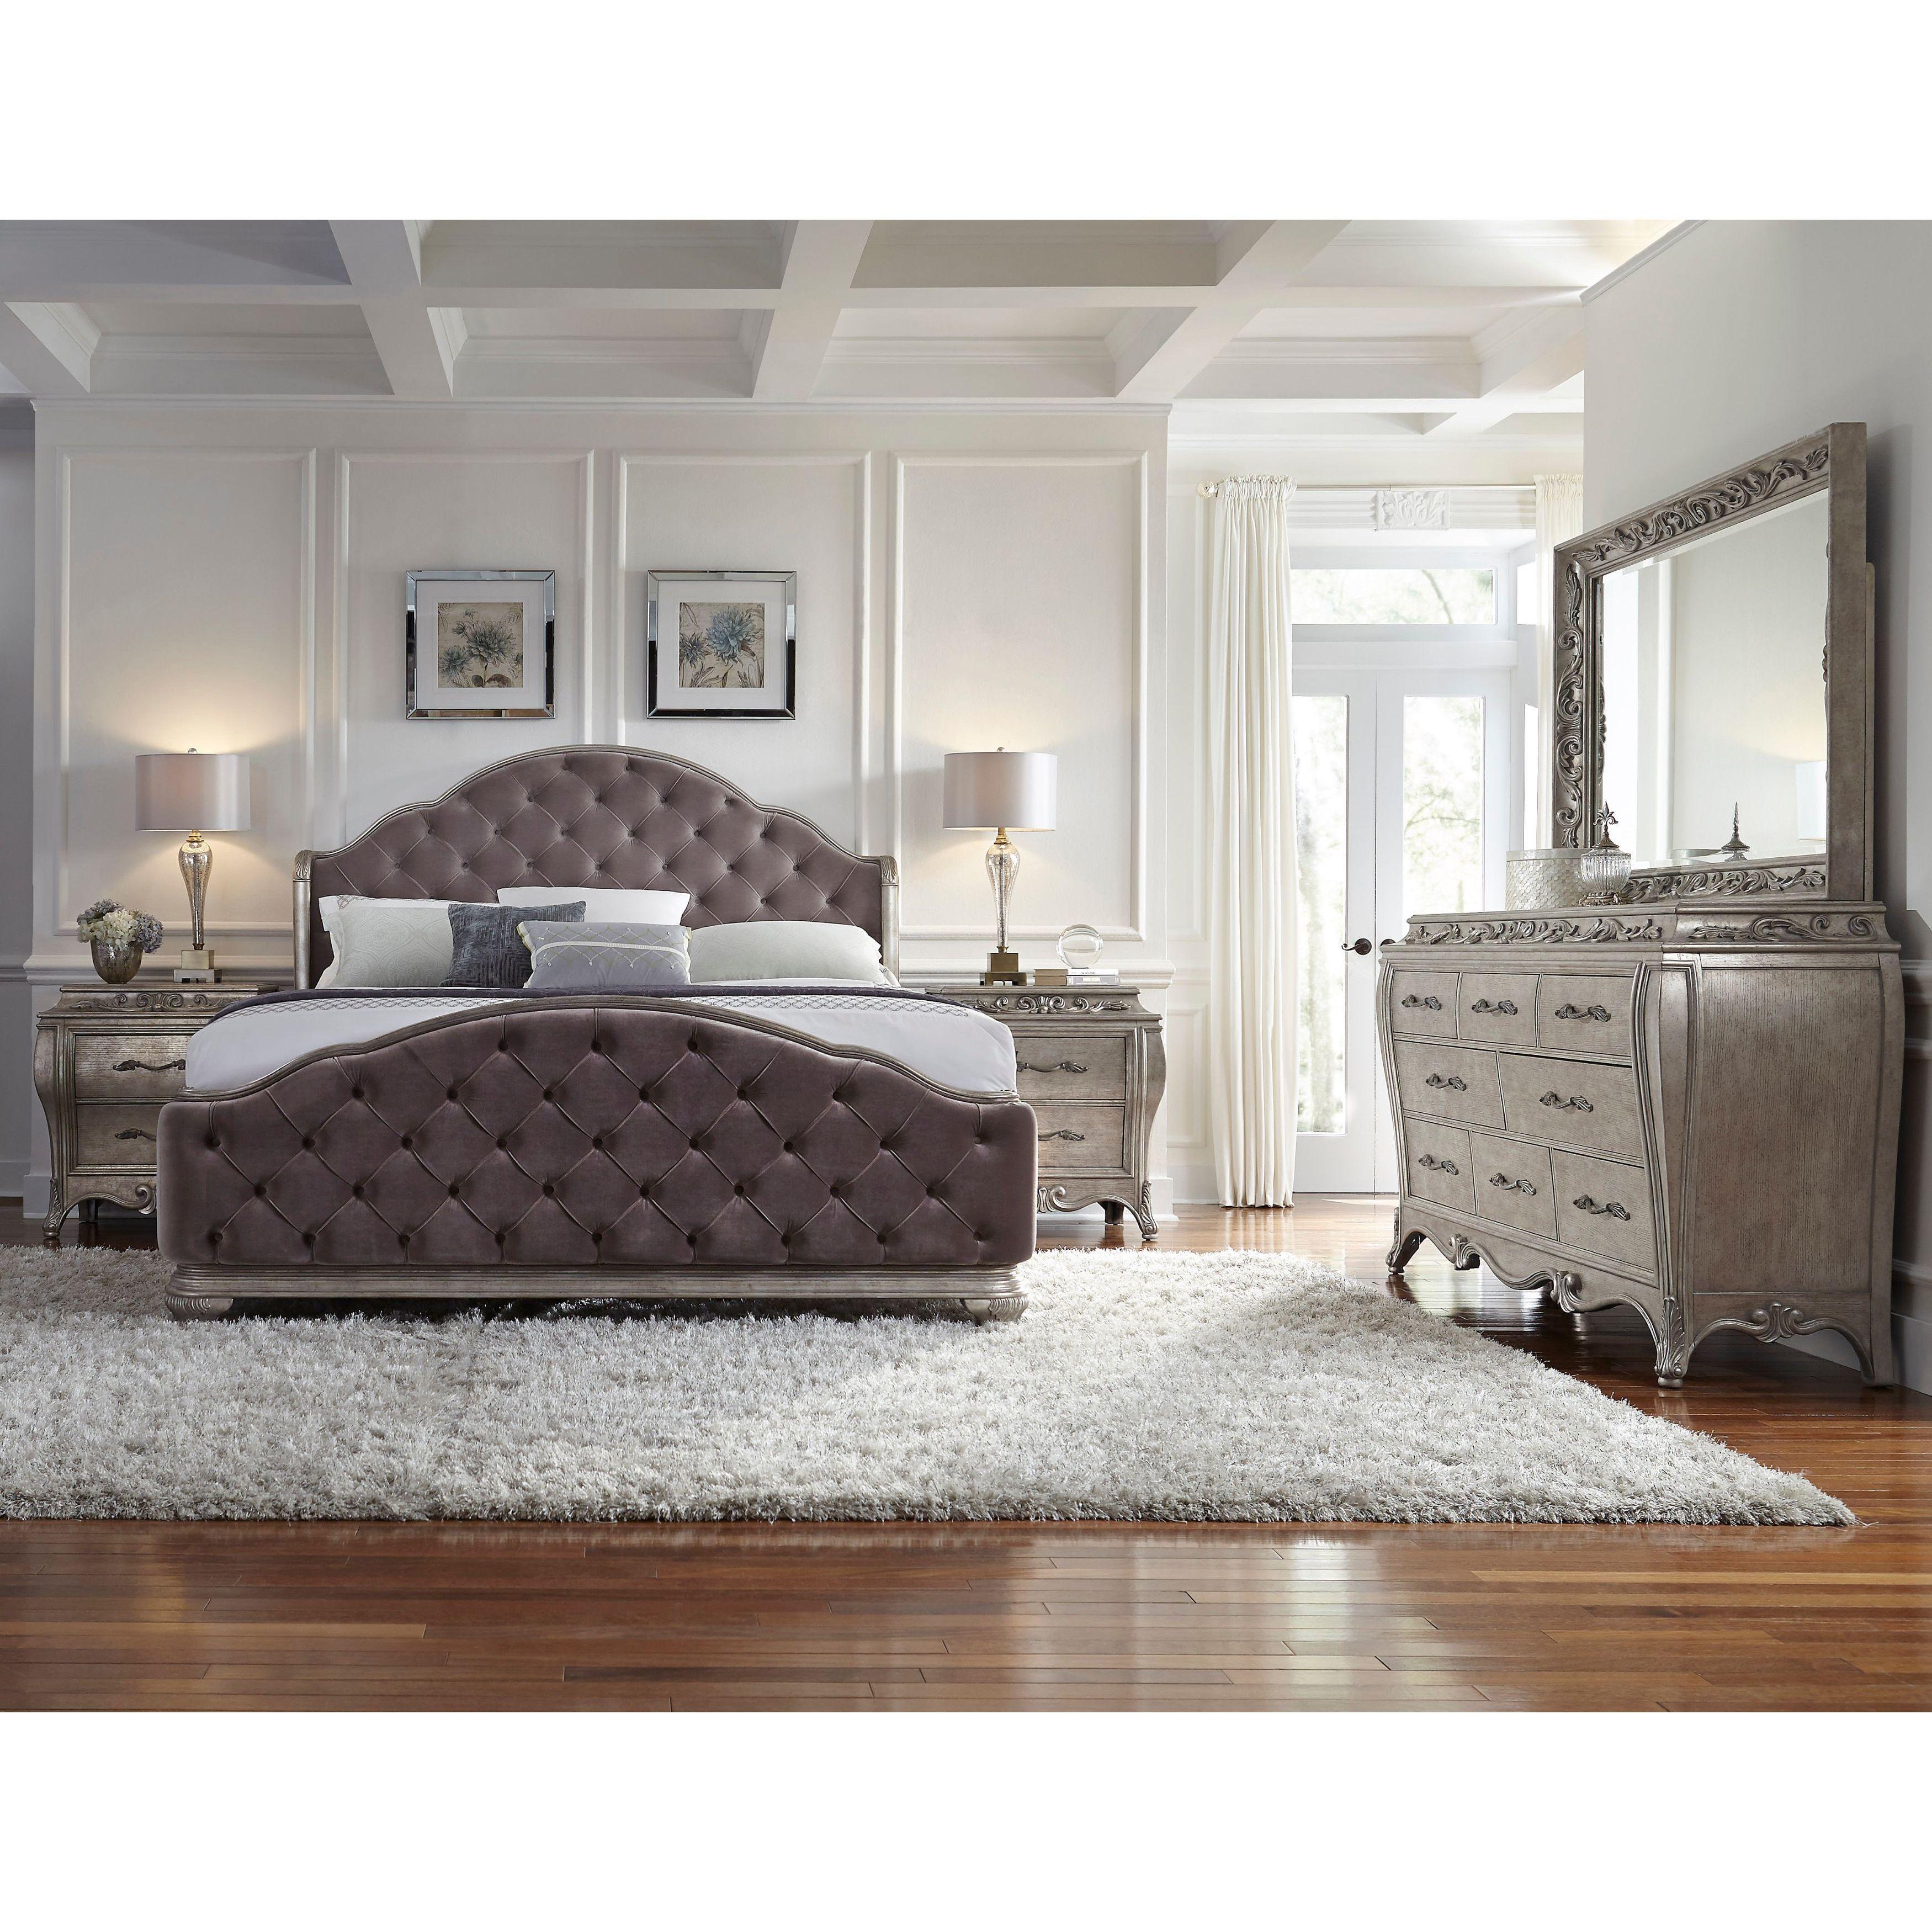 Anastasia 5 Piece King Size Bedroom Set Bedroom Set Grey Size